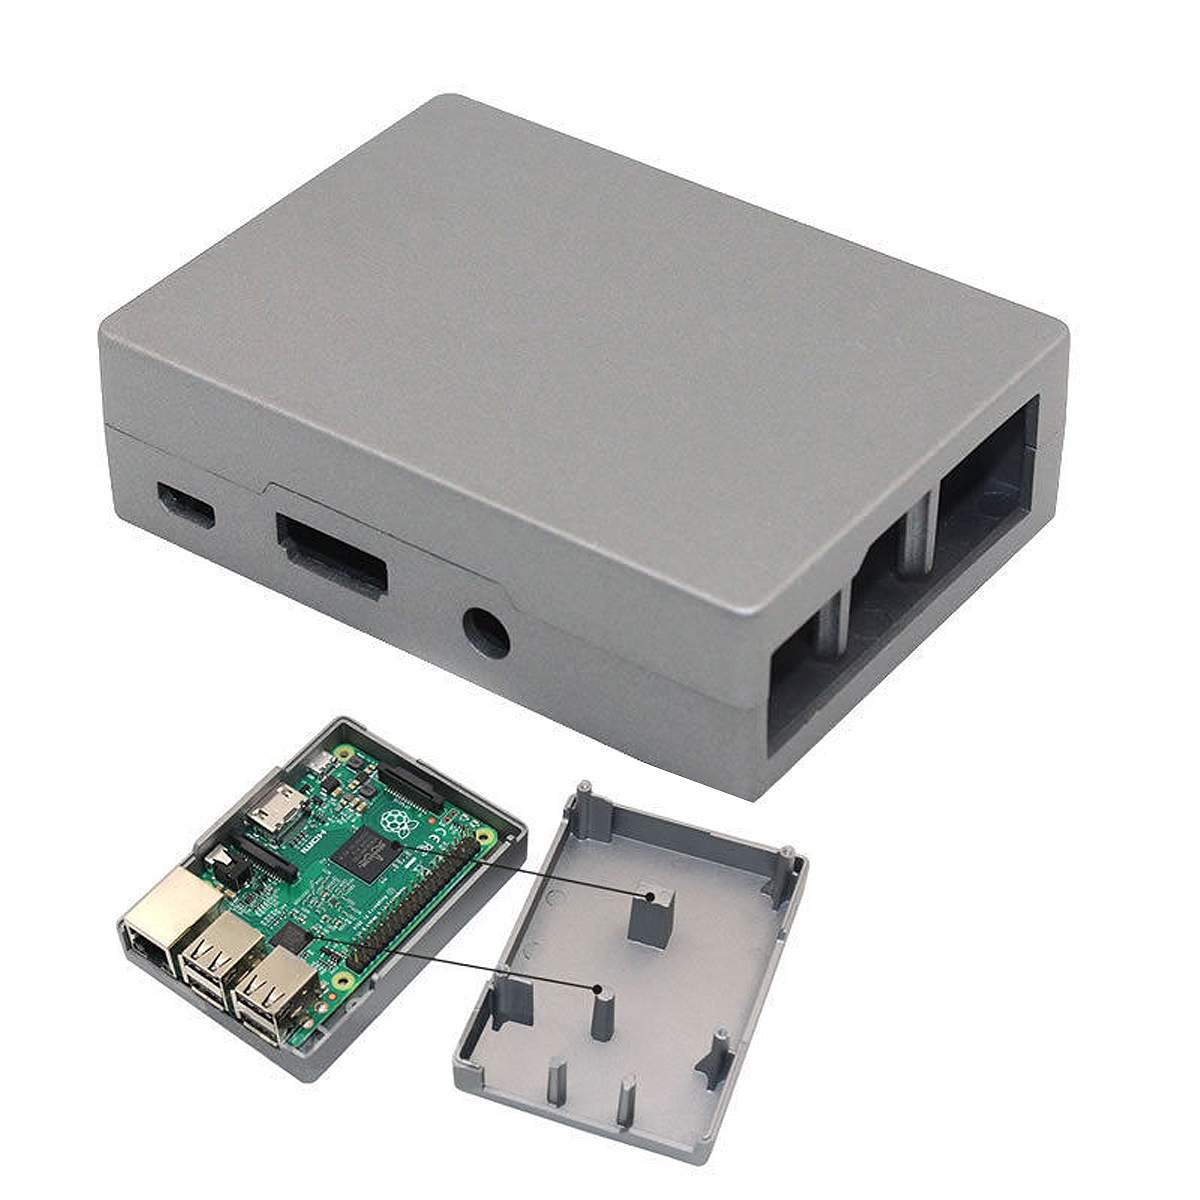 Durable Aluminum Alloy Enclosure Metal Case Box For Pi B+/B/Pi 2/Pi 3 No Need HeatSink Fan Necessary Port Interface For External